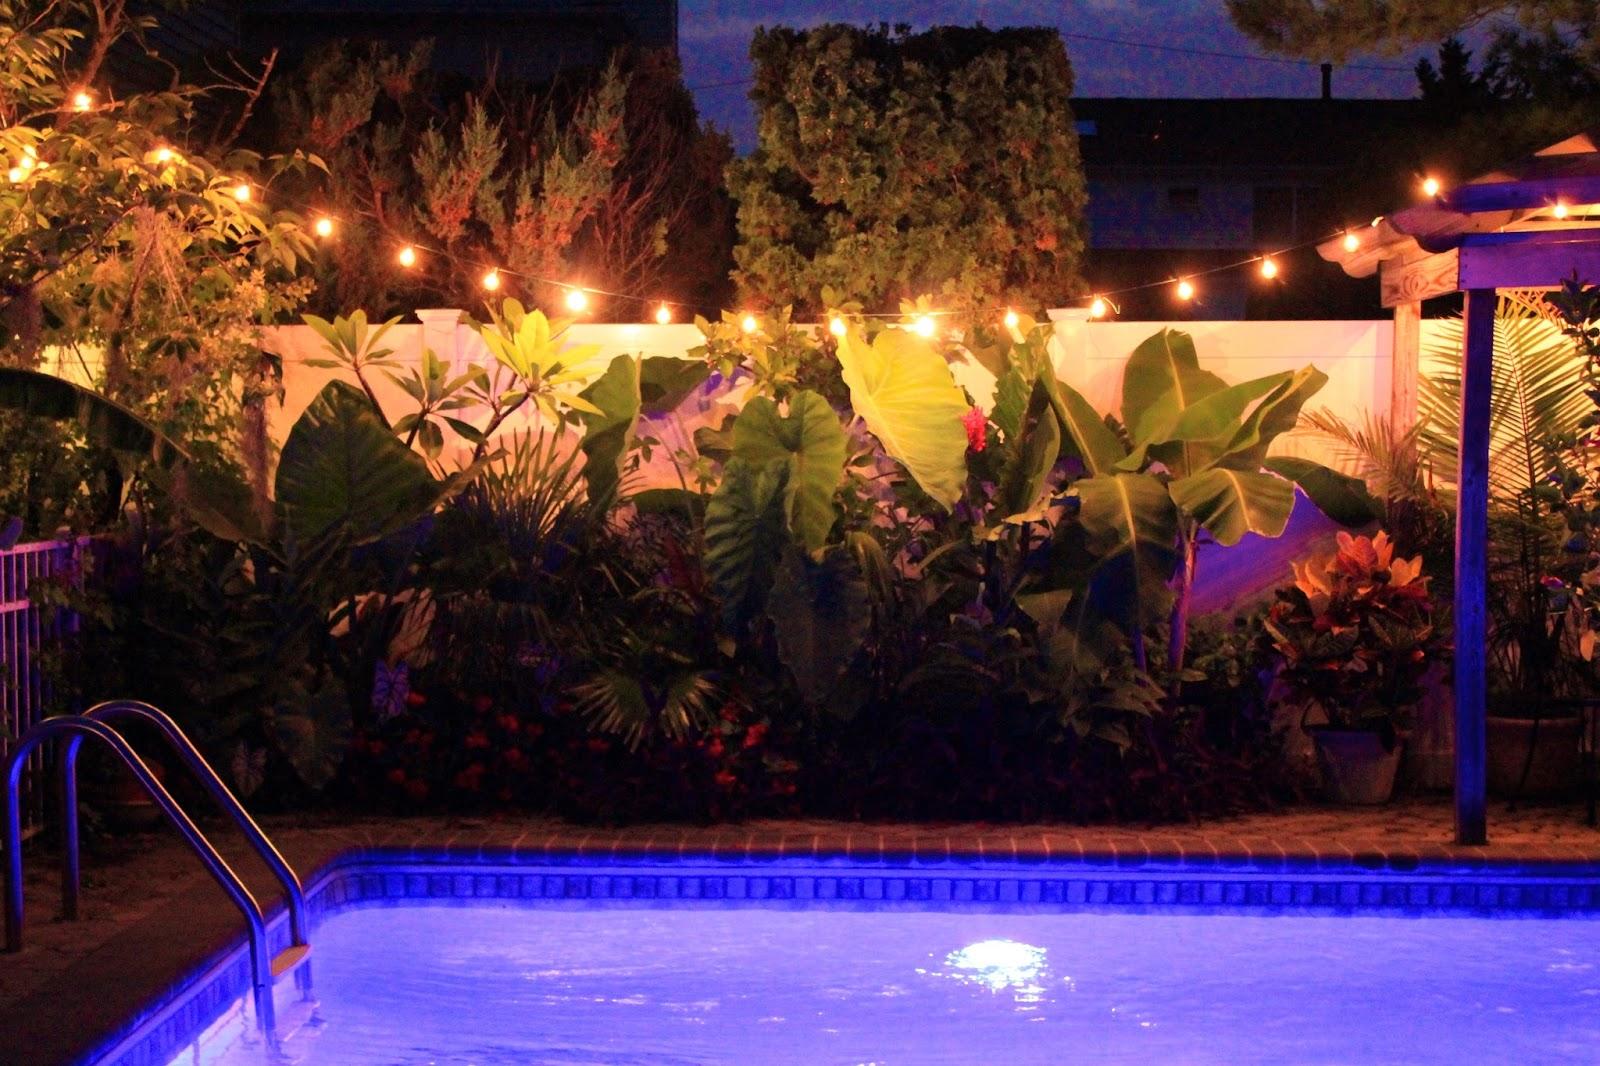 tropical gardening in new york city!: night pics around the pool area